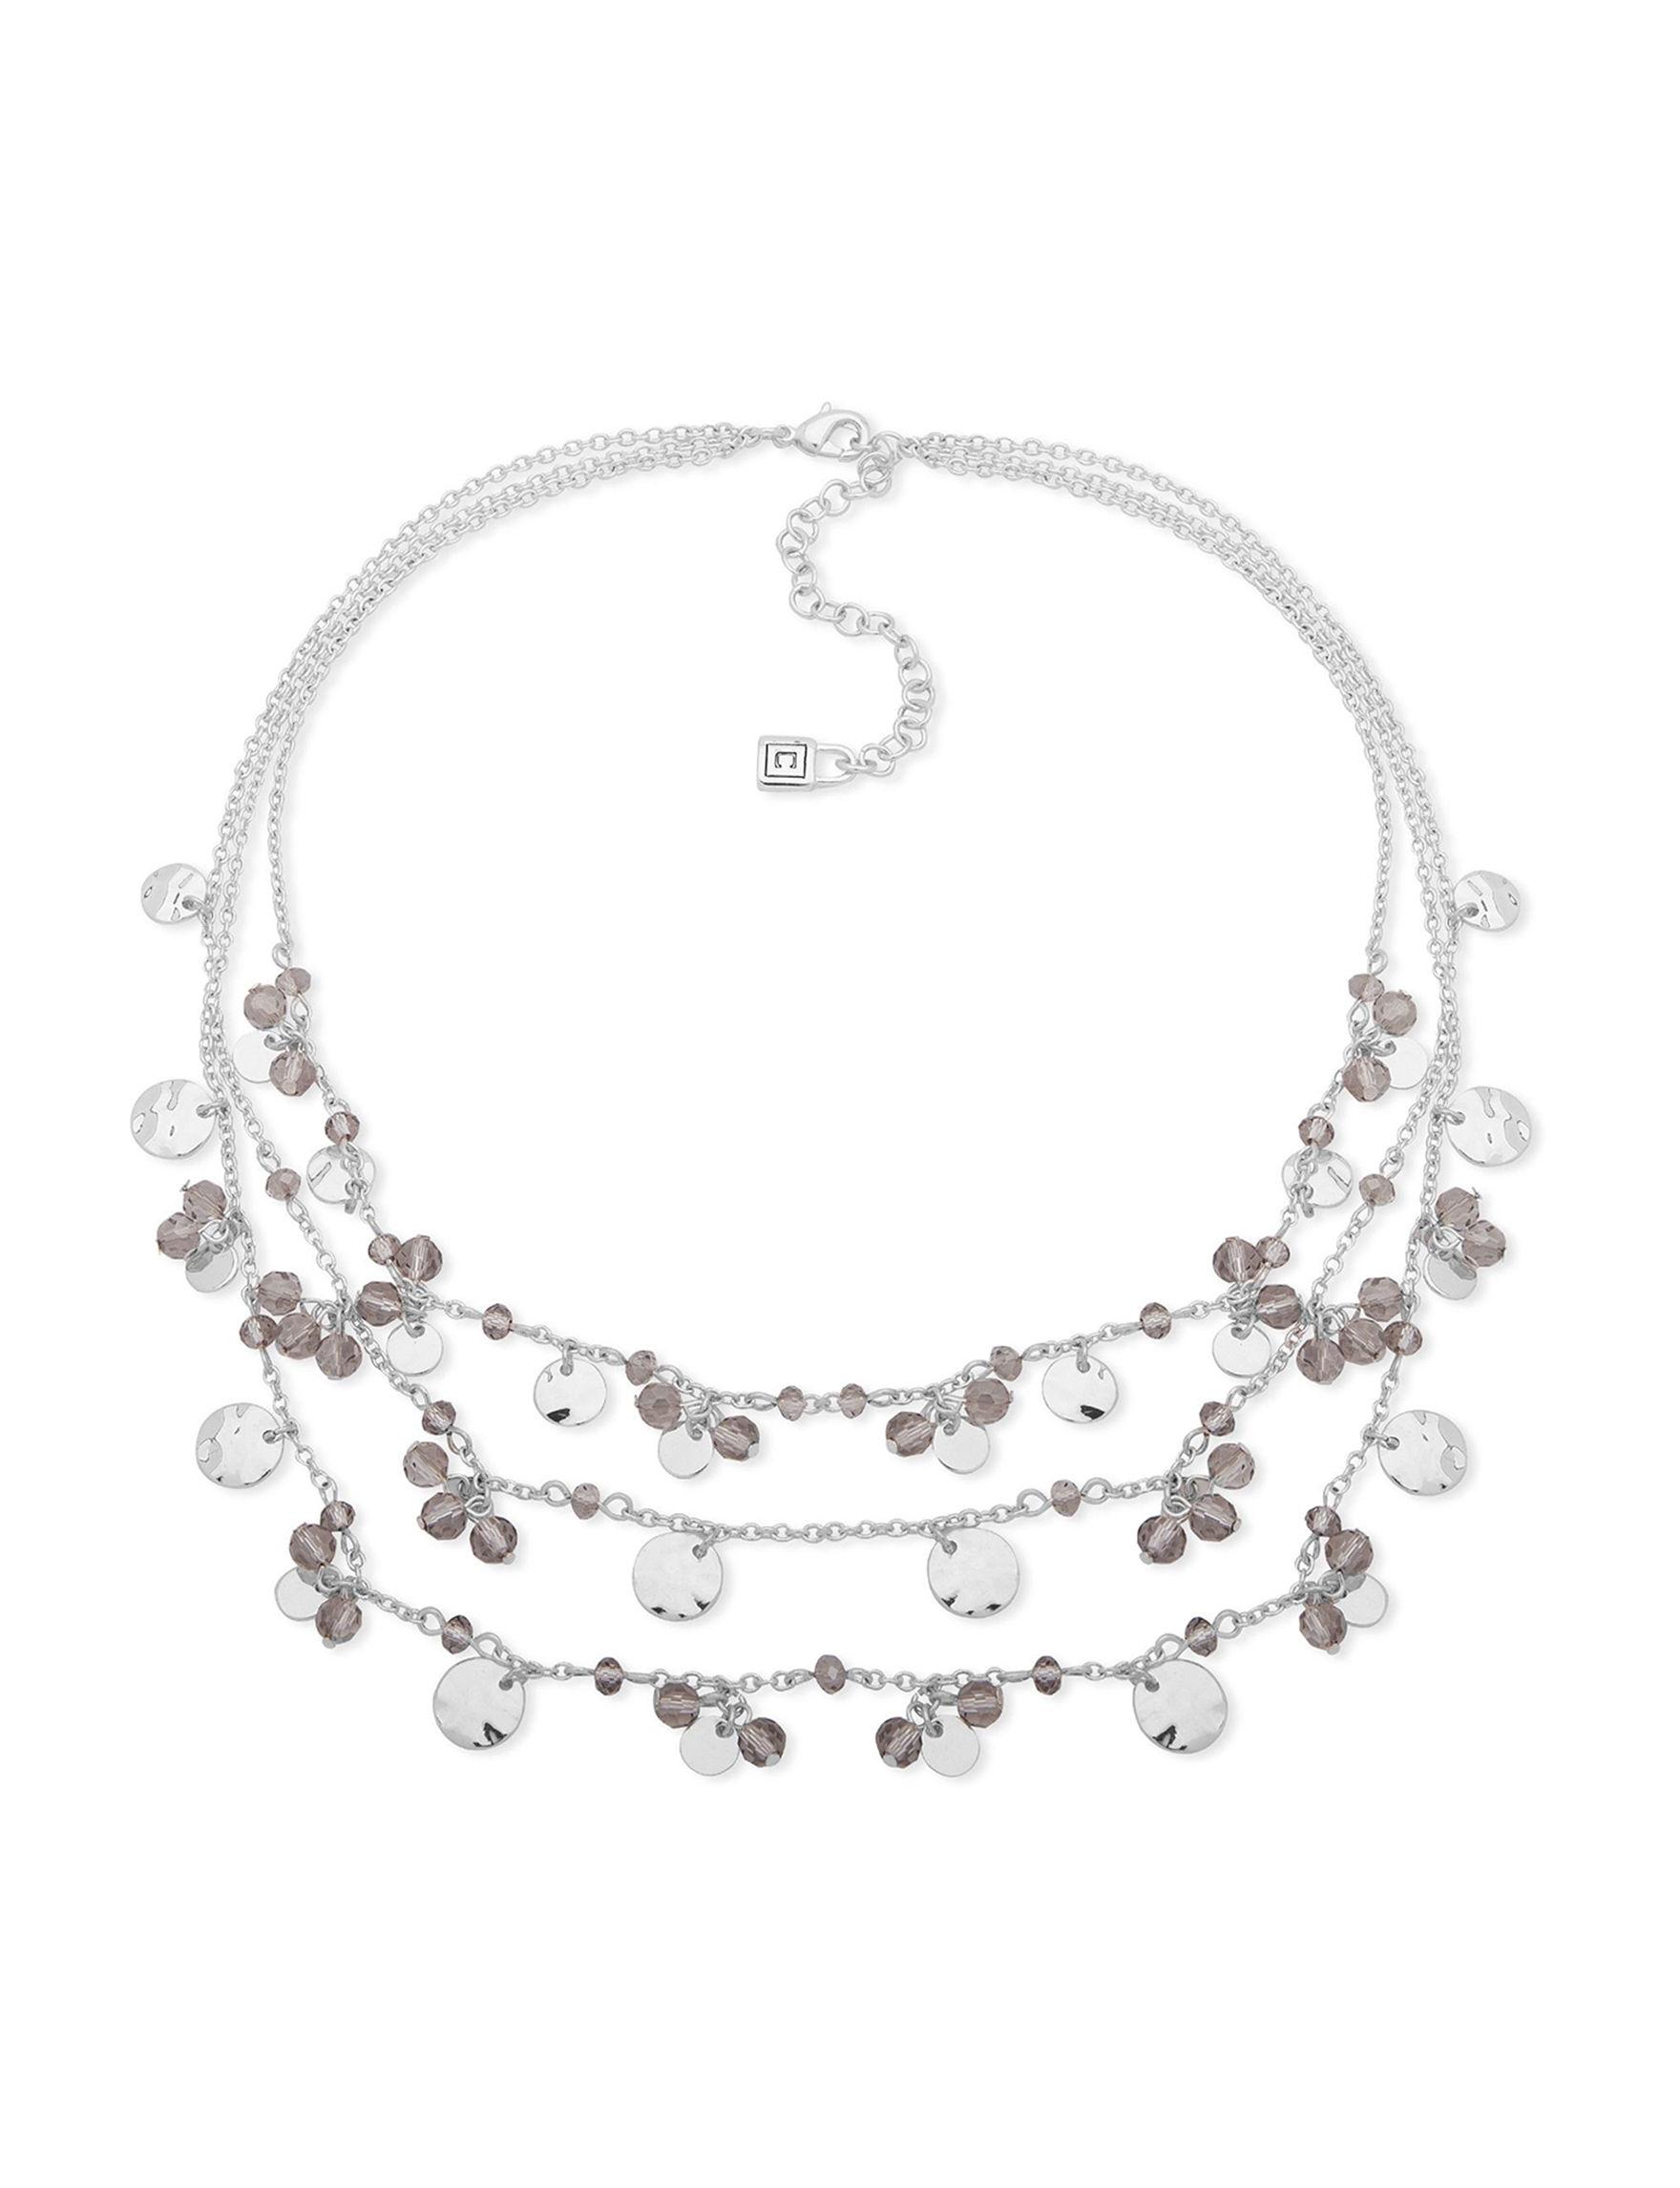 Chaps Silver Necklaces & Pendants Fashion Jewelry